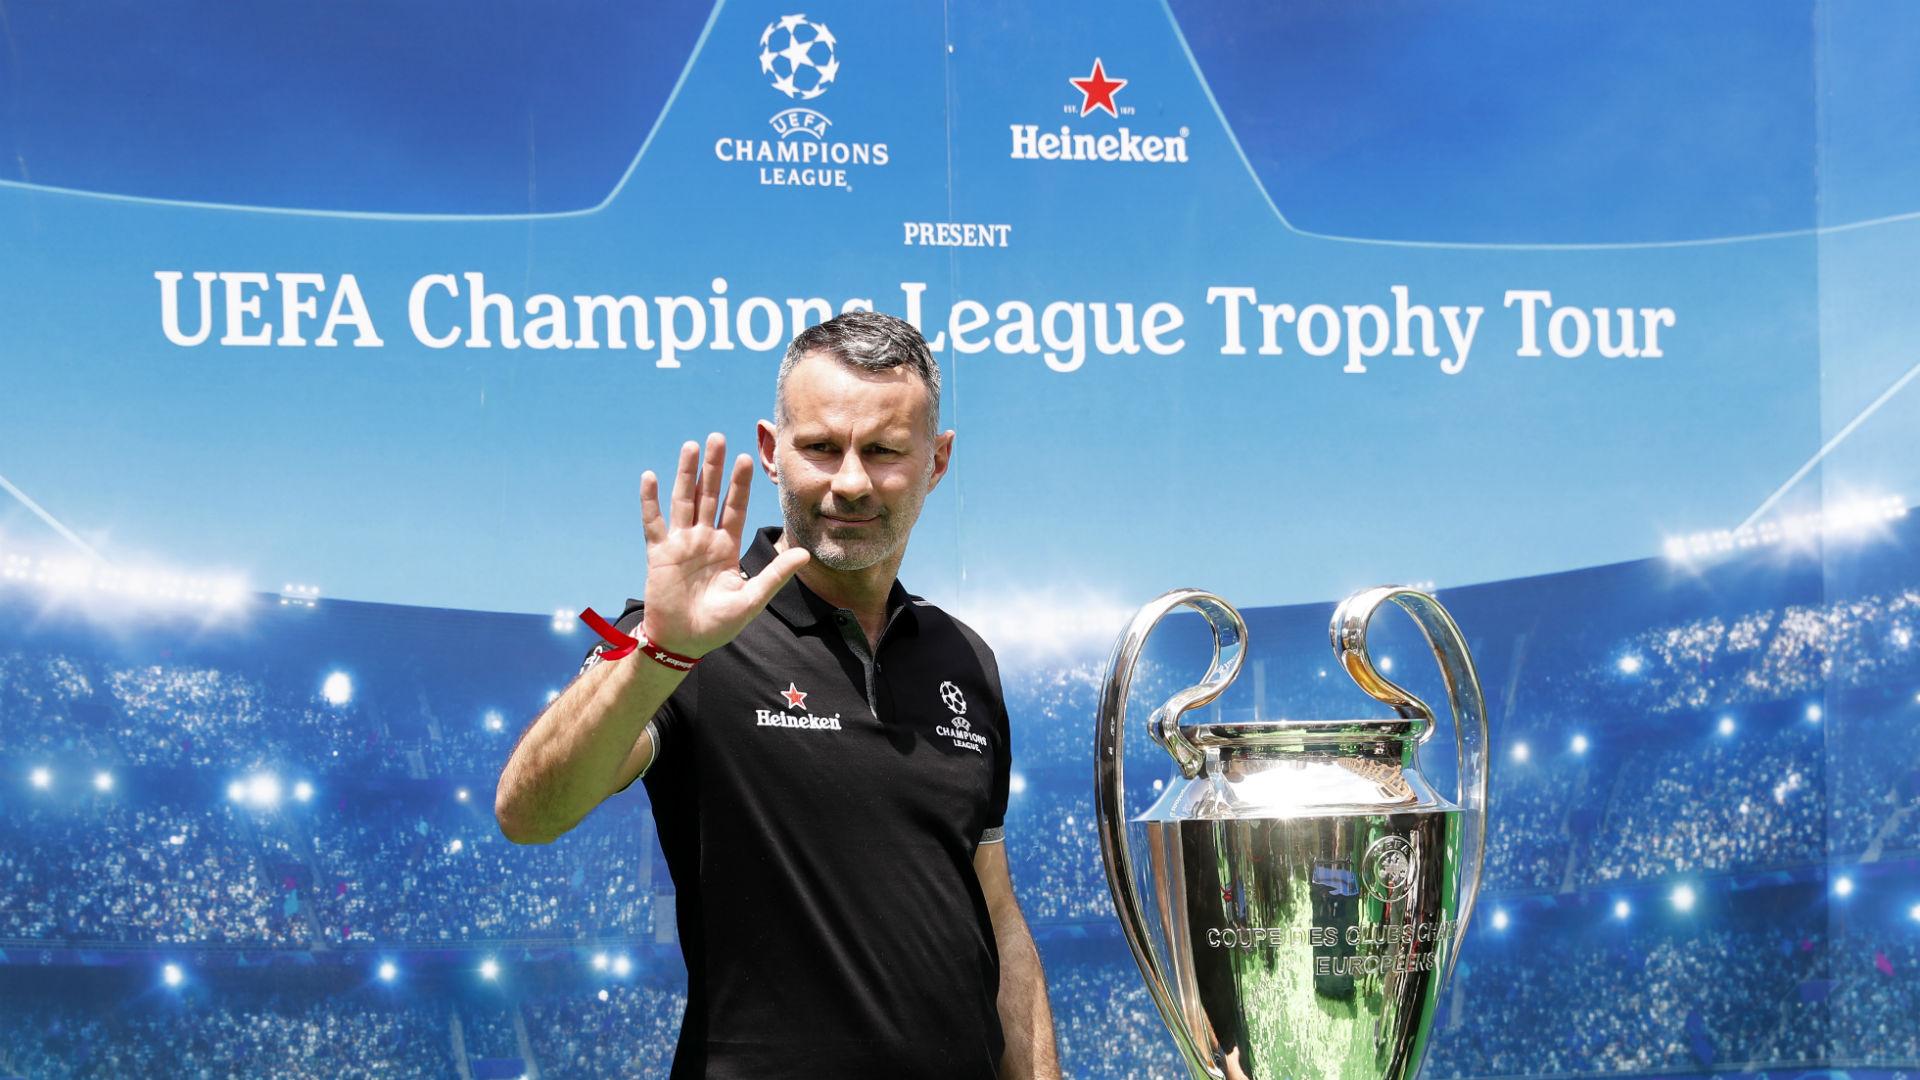 Ryan Giggs Heineken Champions League trophy tour